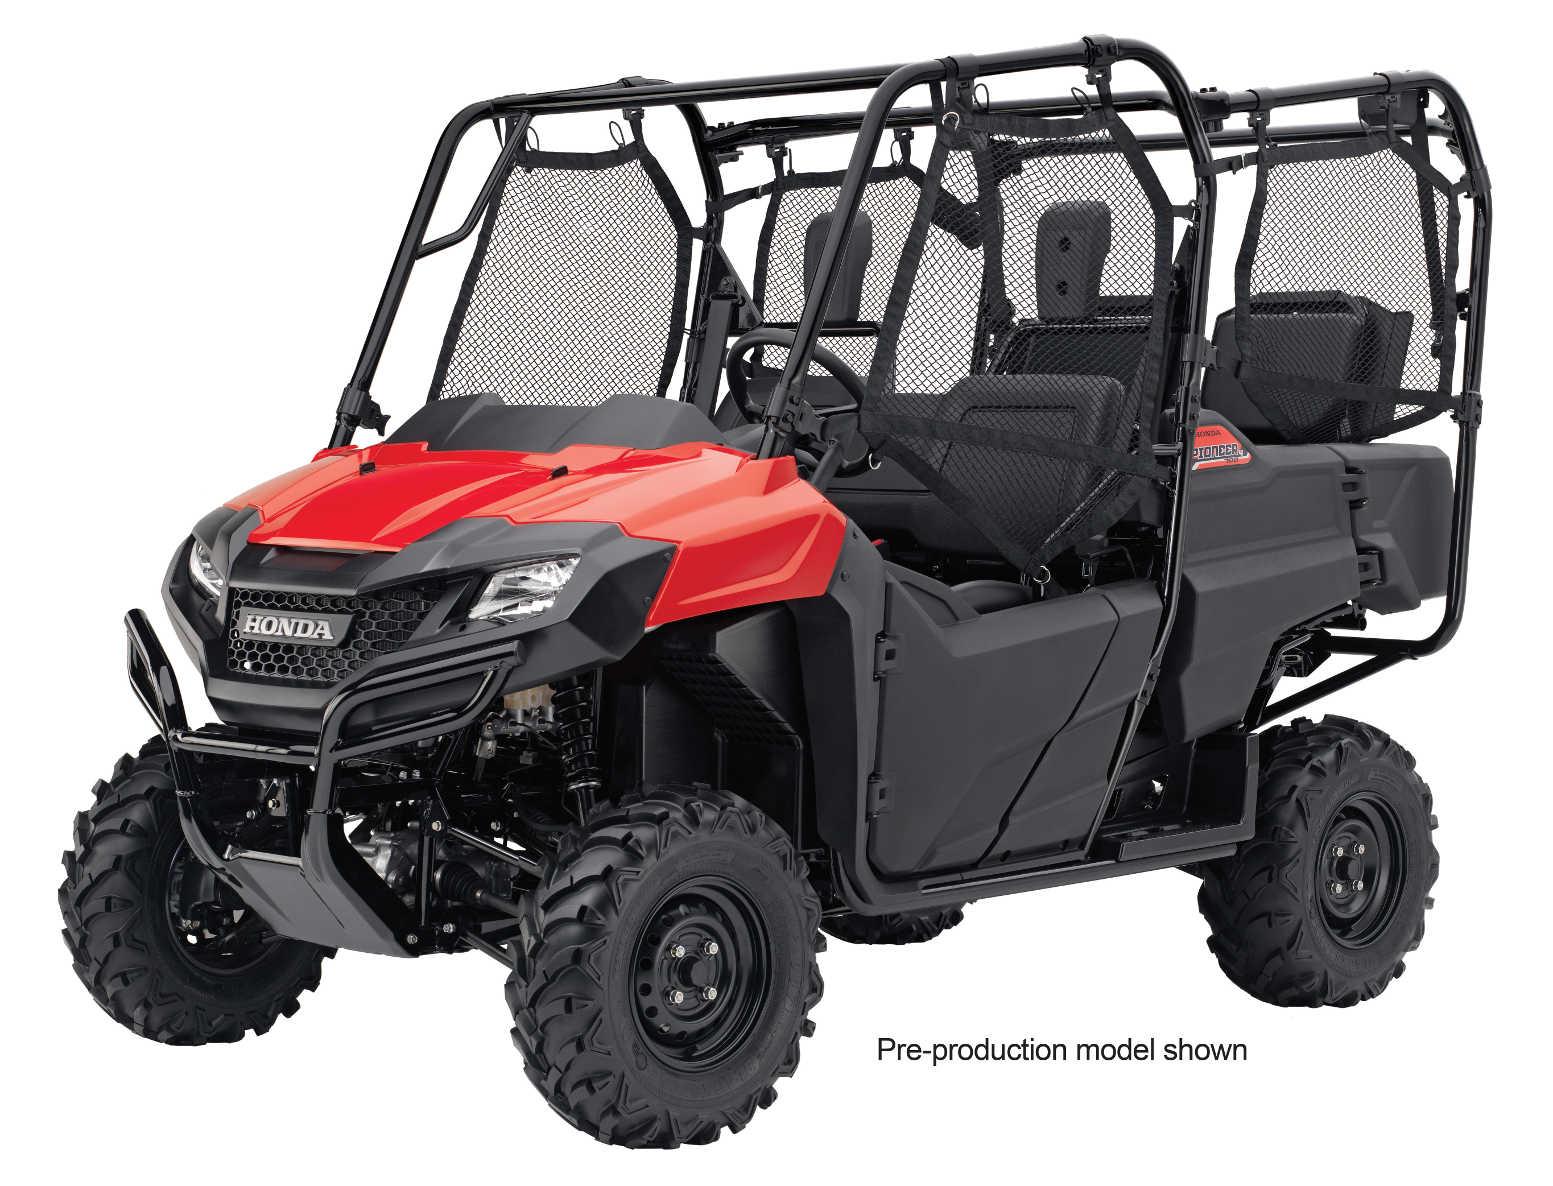 Polaris Side By Side >> Honda Announces 2016 Pioneer 1000 | ATV Illustrated